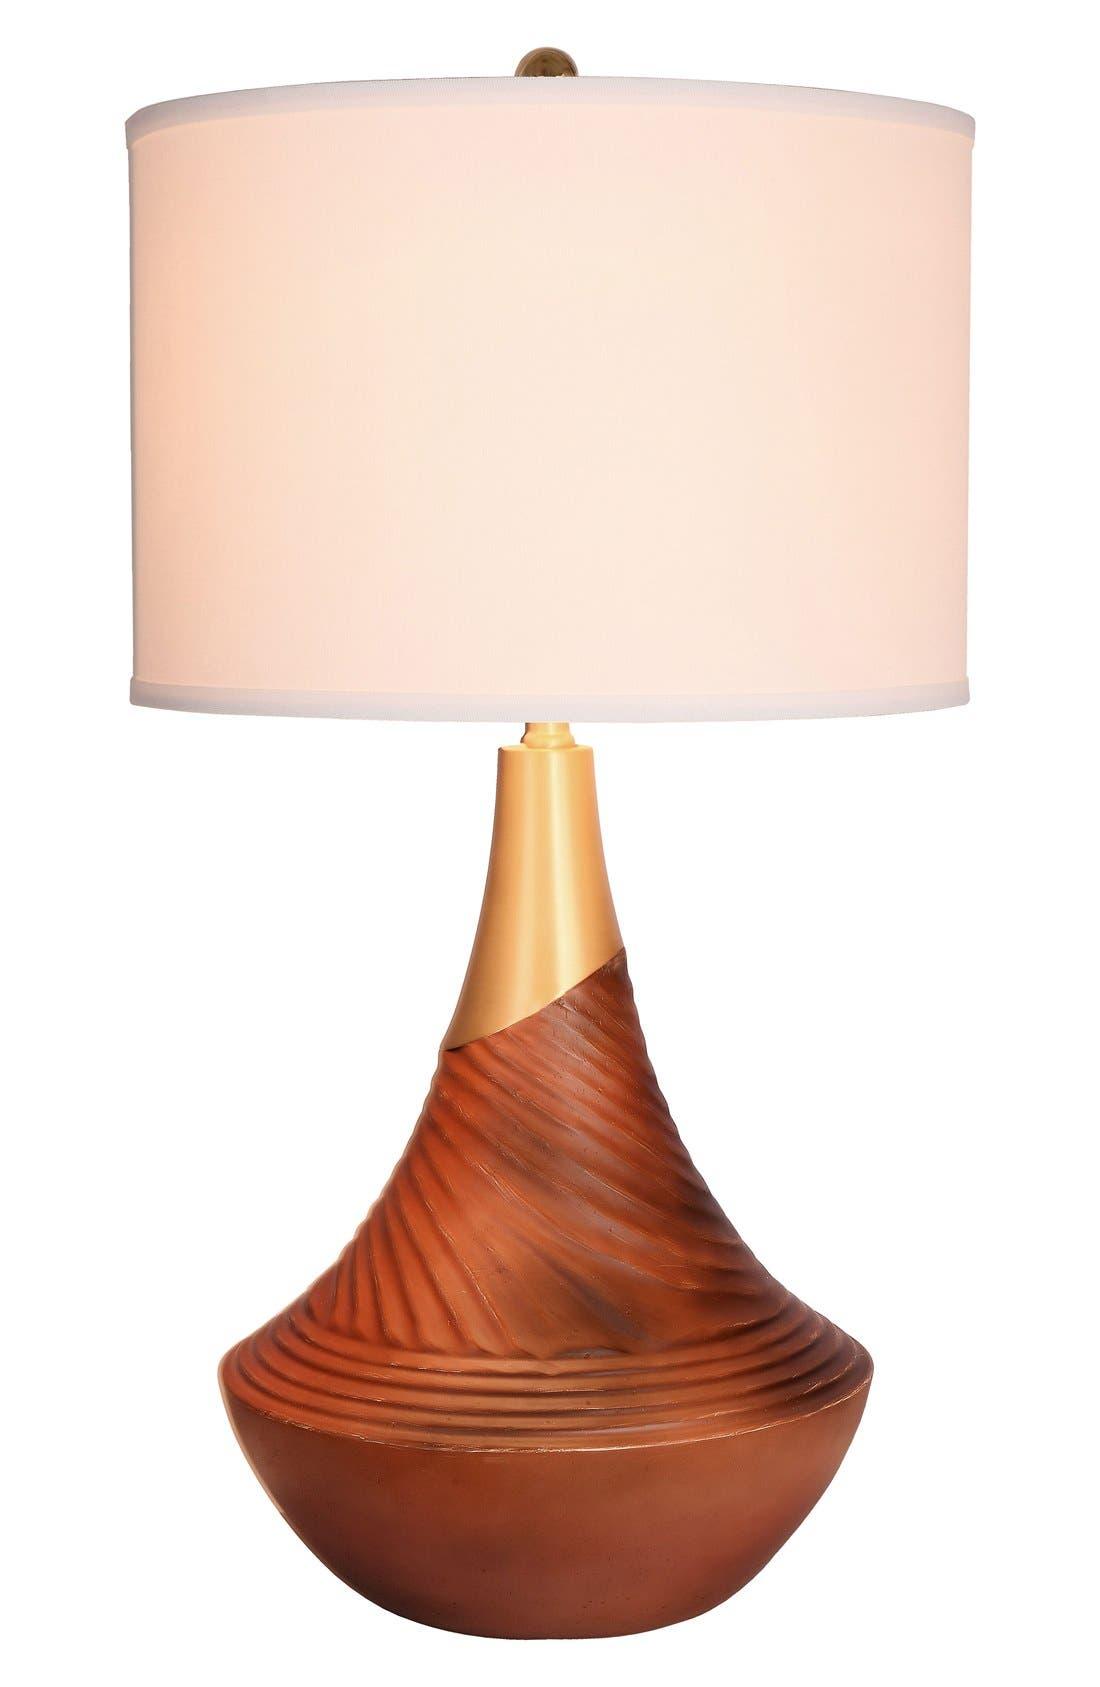 JAlexander Cora Resin Table Lamp,                             Main thumbnail 1, color,                             200